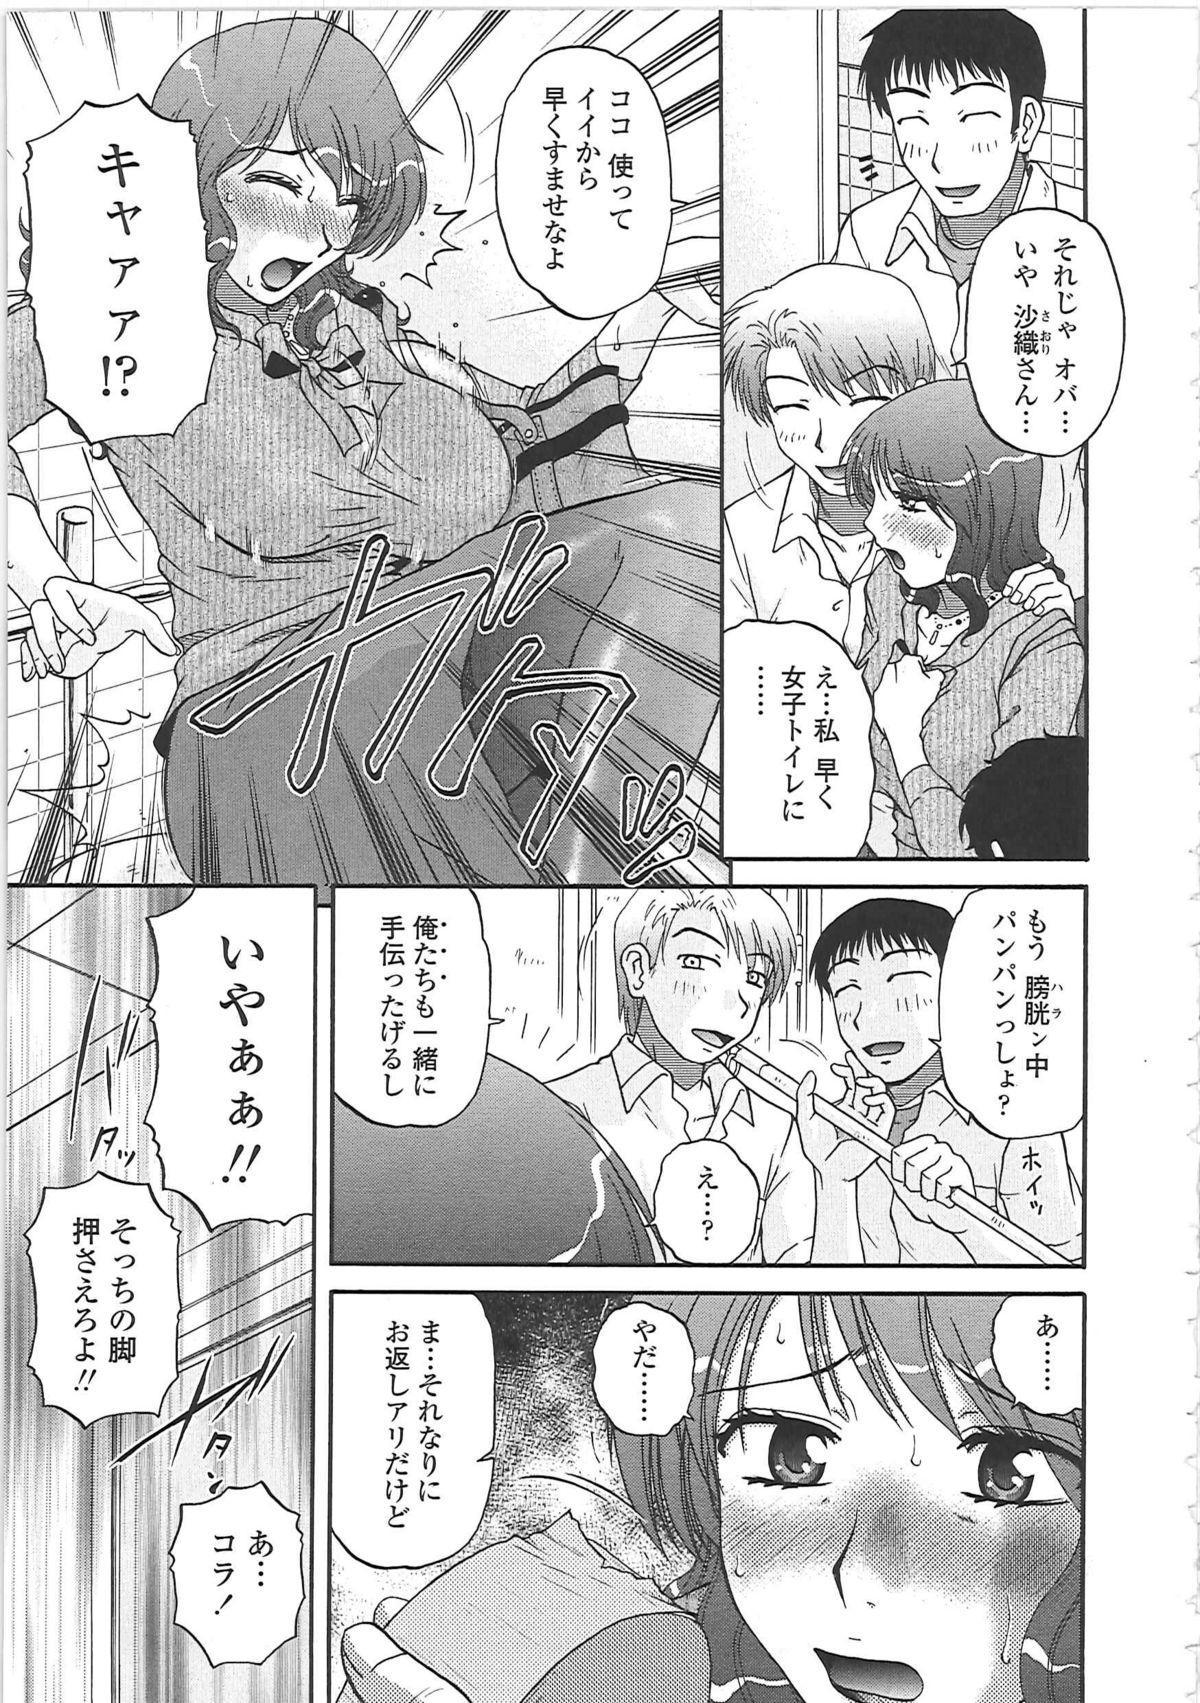 Nikuzuma Tsuushin - Erotic Wife Communication 115